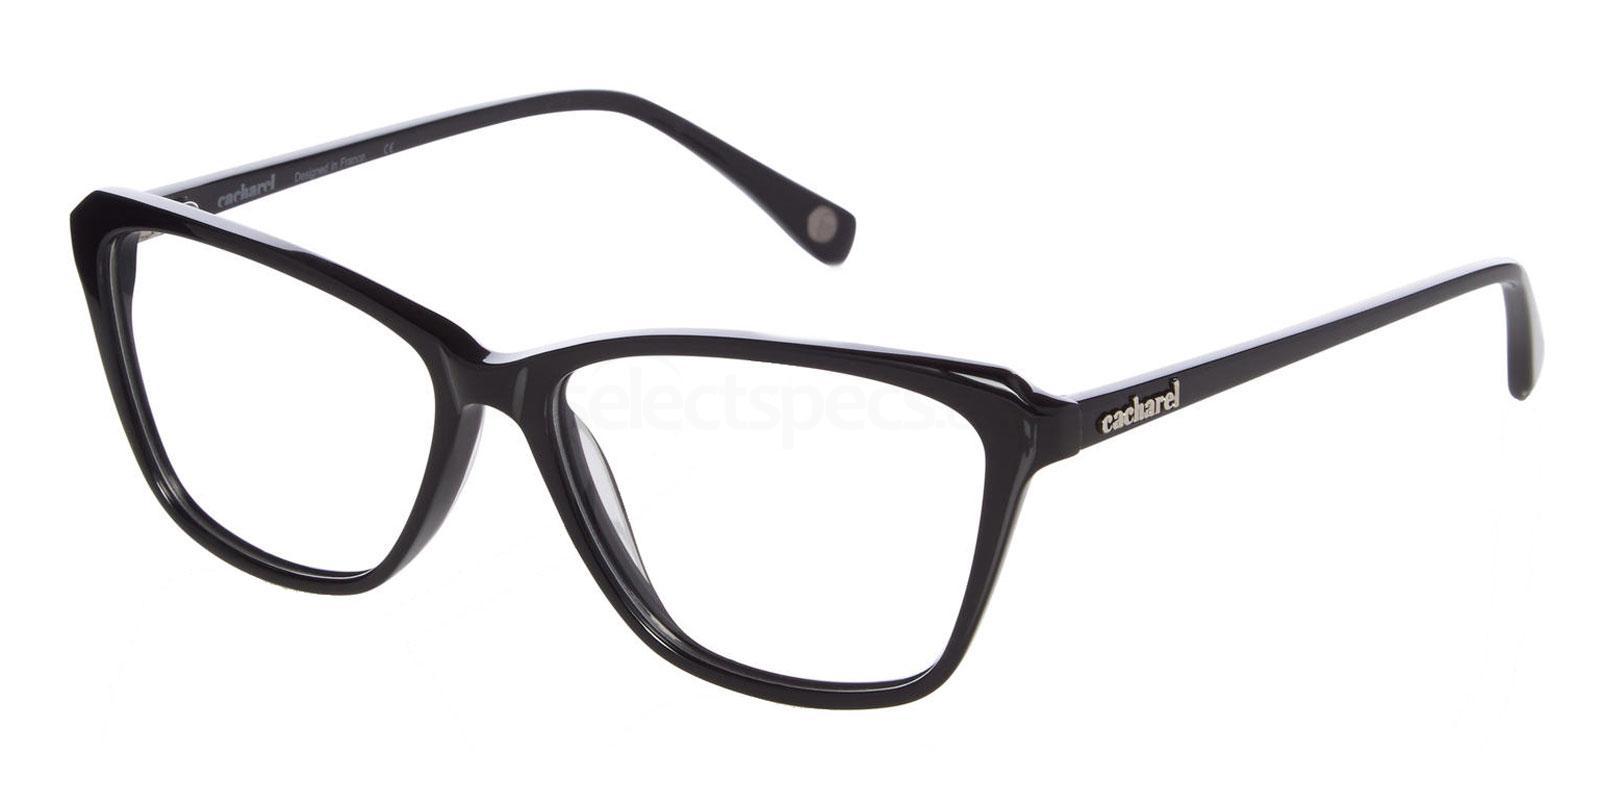 001 CA3039 Glasses, Cacharel